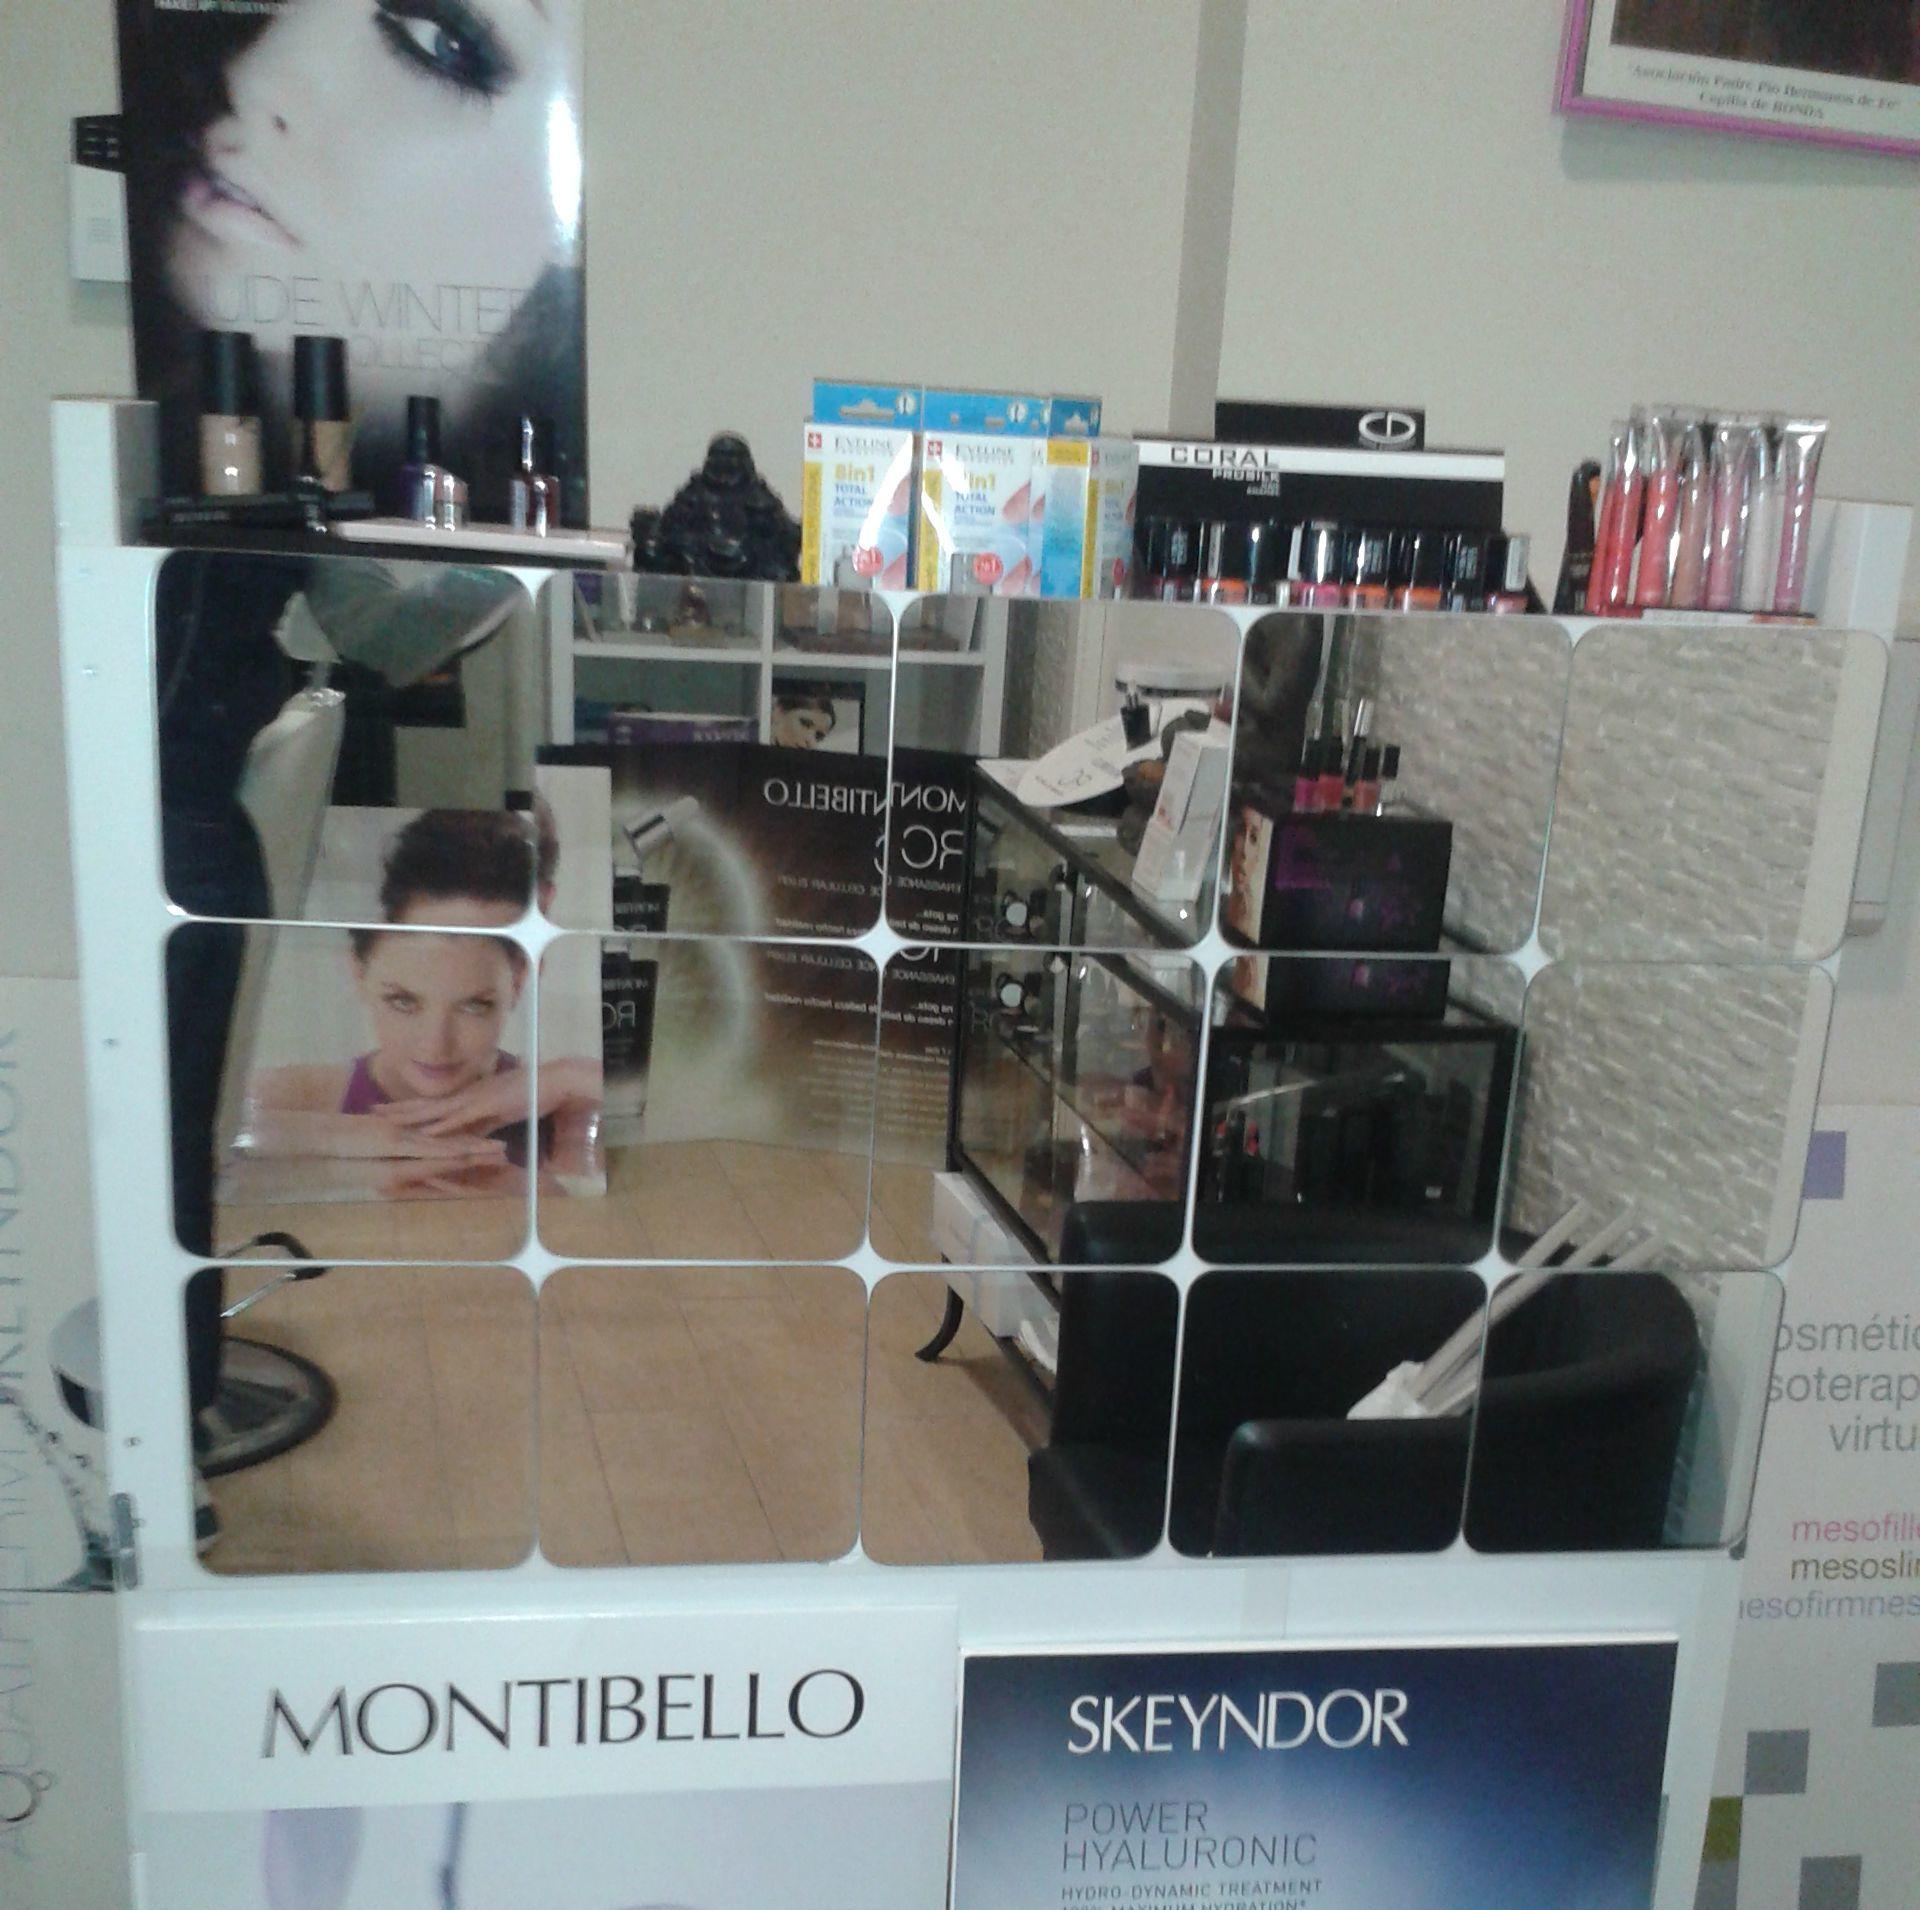 Foto 78 de Centros de estética en Jerez de la Frontera | Estetikk@ Alejandra Motta